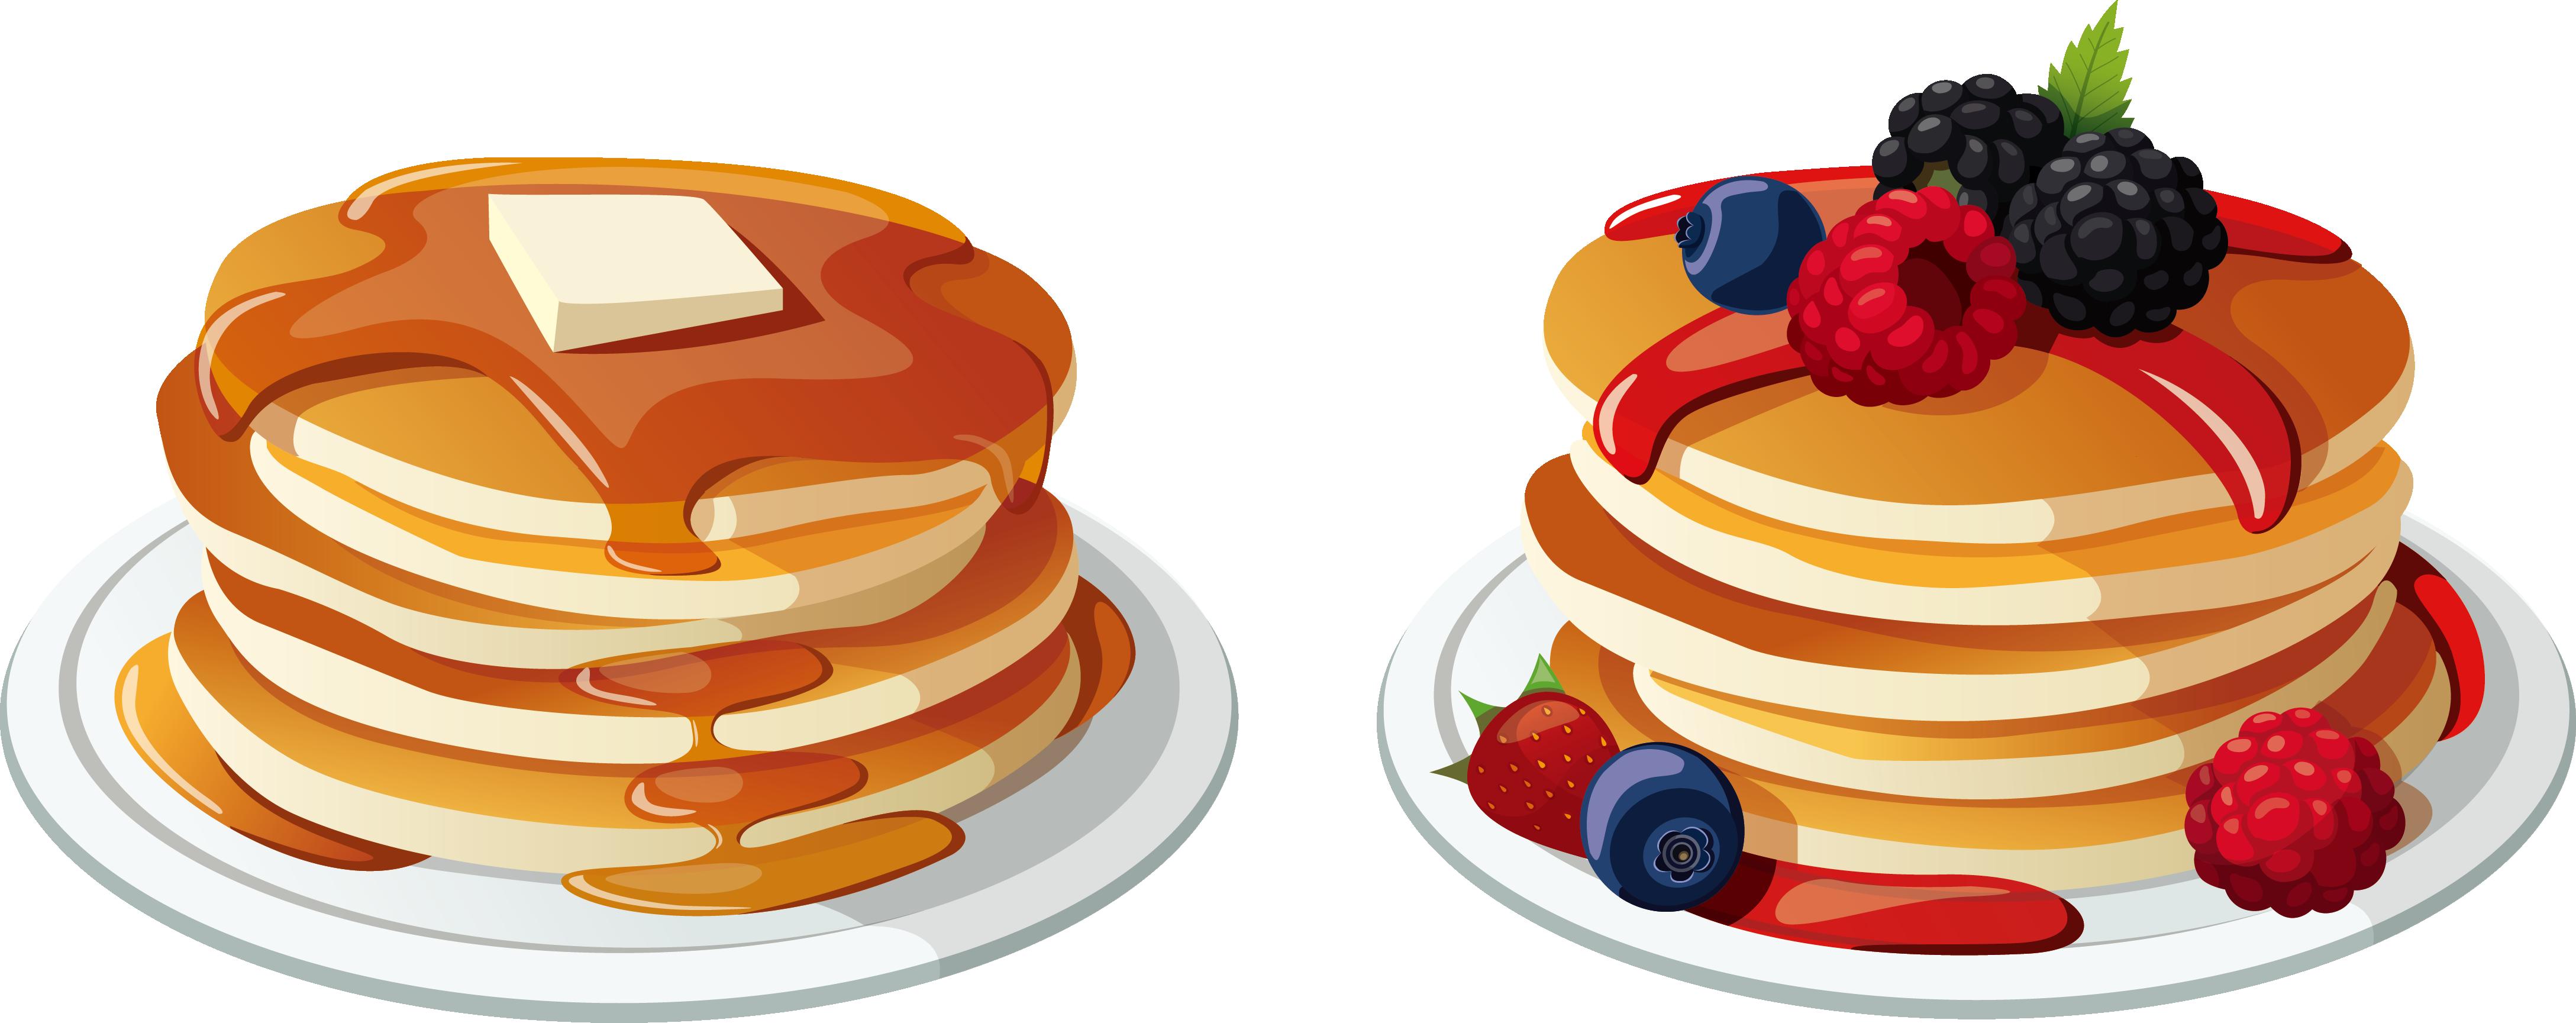 svg freeuse library Pancake vector transparent. Pancakes clipart breakfest frames.